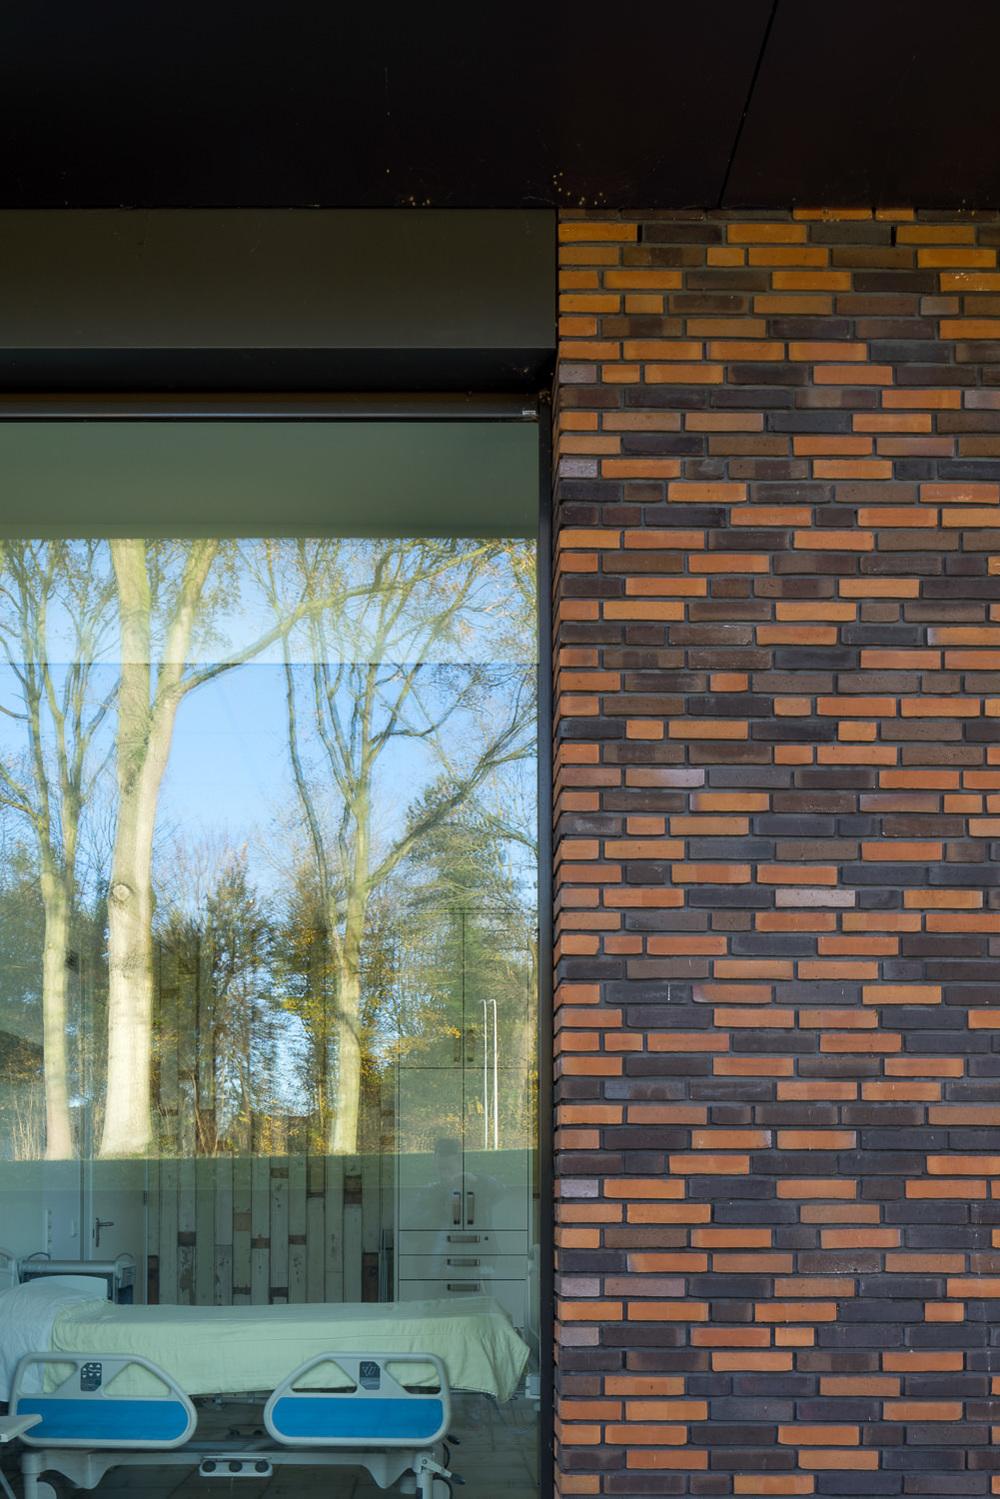 team-4-groningen-haren-beatrixoord-mark-hadden-amsterdam-architecture-photographer-architectuurfotograaf-049.jpg